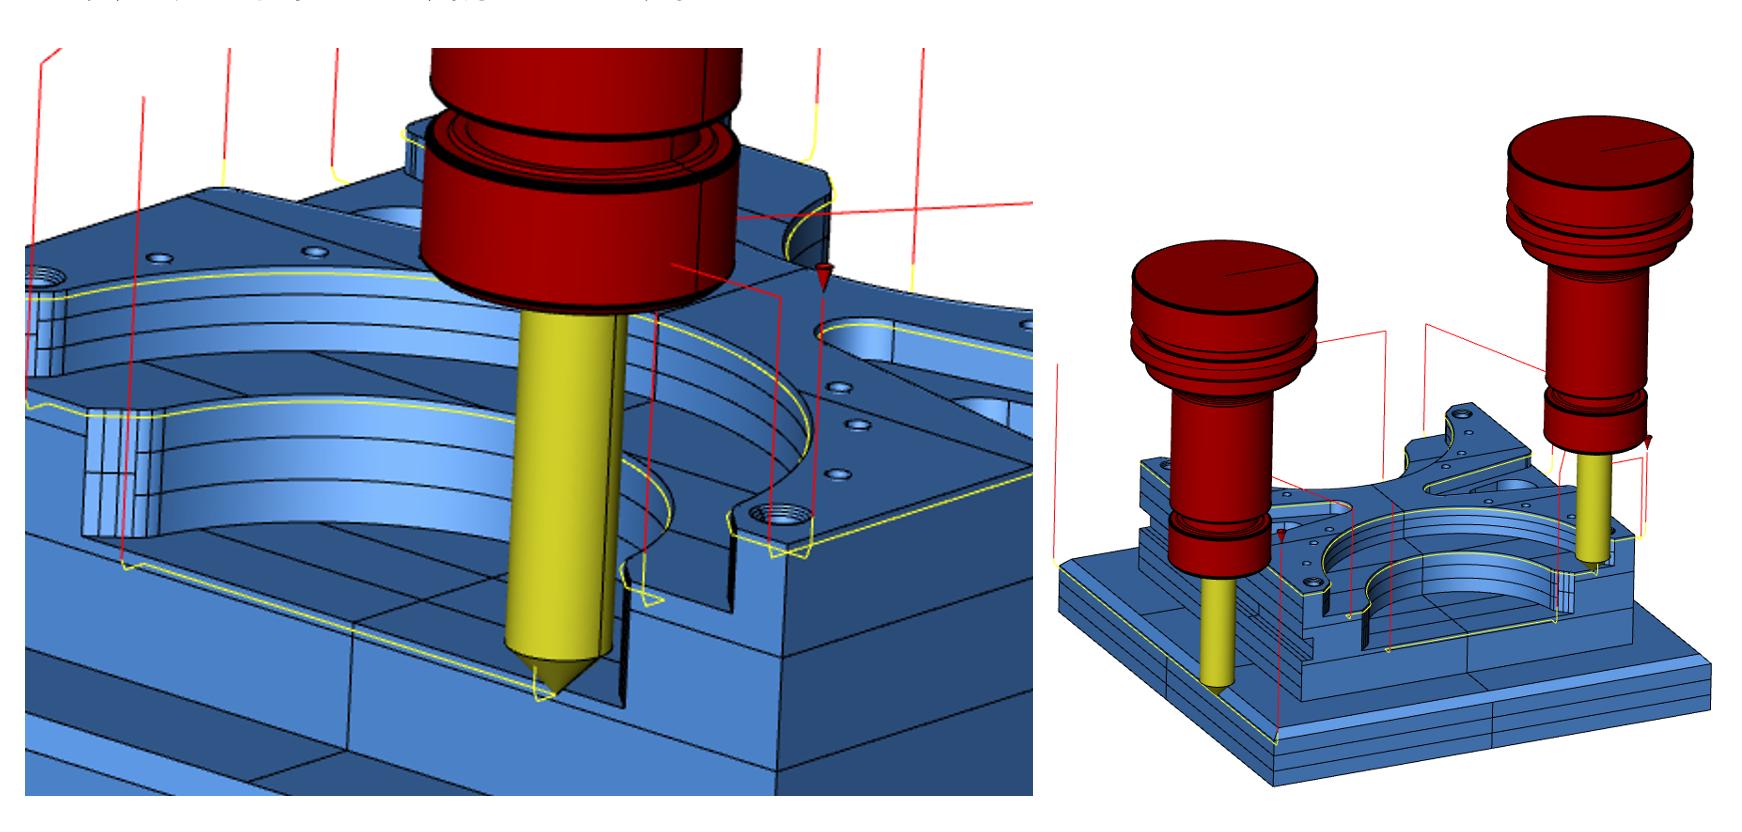 3Dモデルを活用した面取り加工